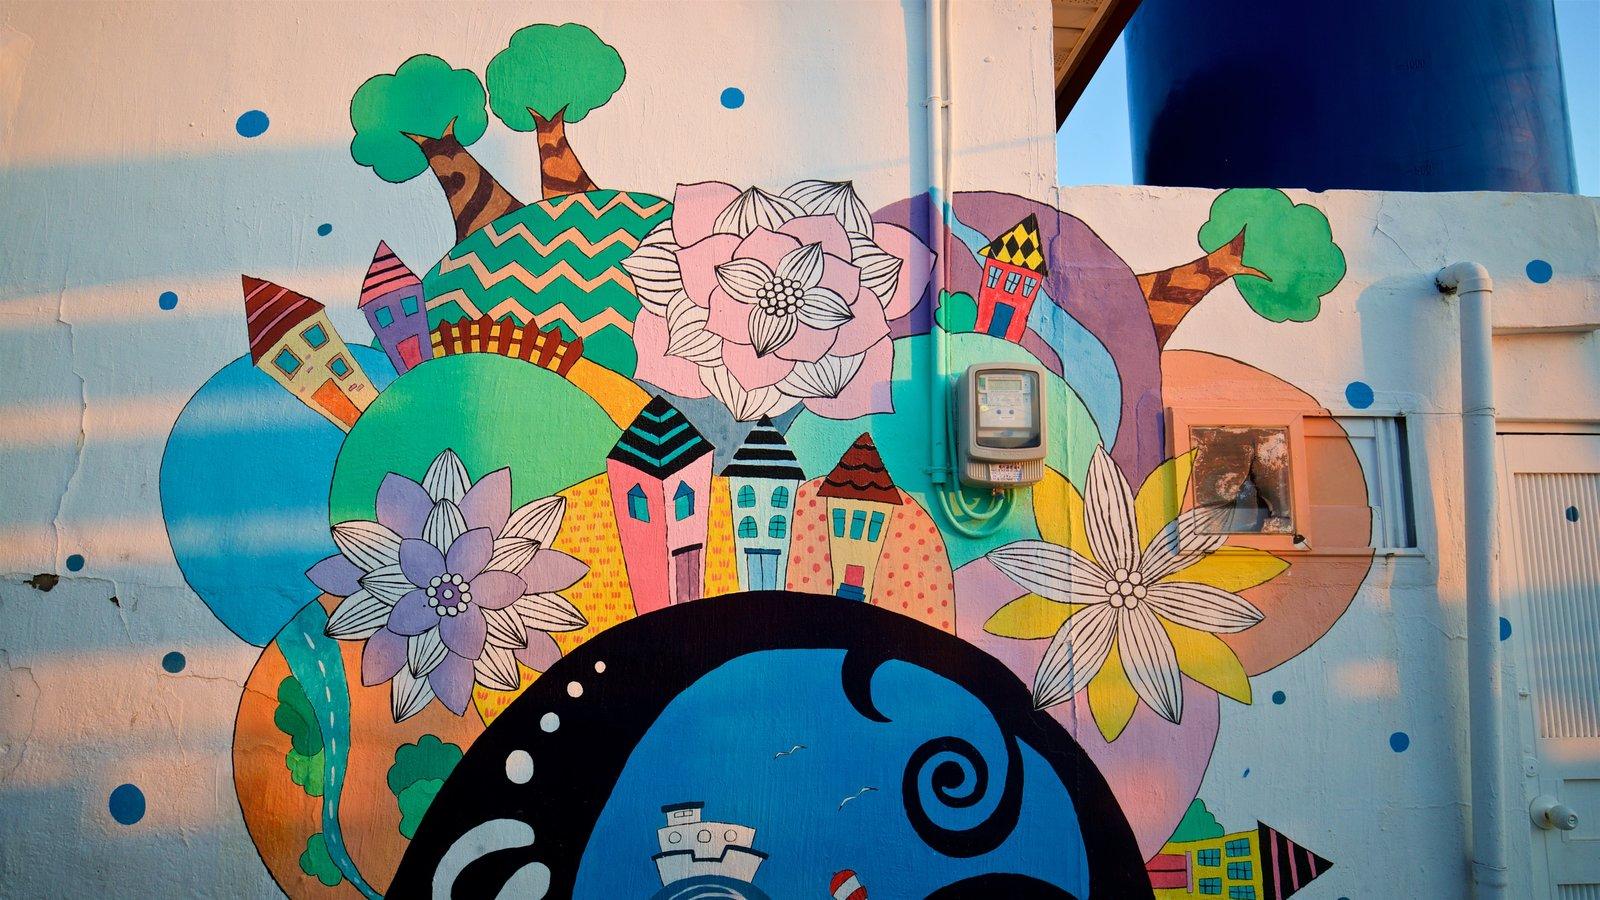 Aldea de muros pintados de Dongpirang que incluye arte al aire libre